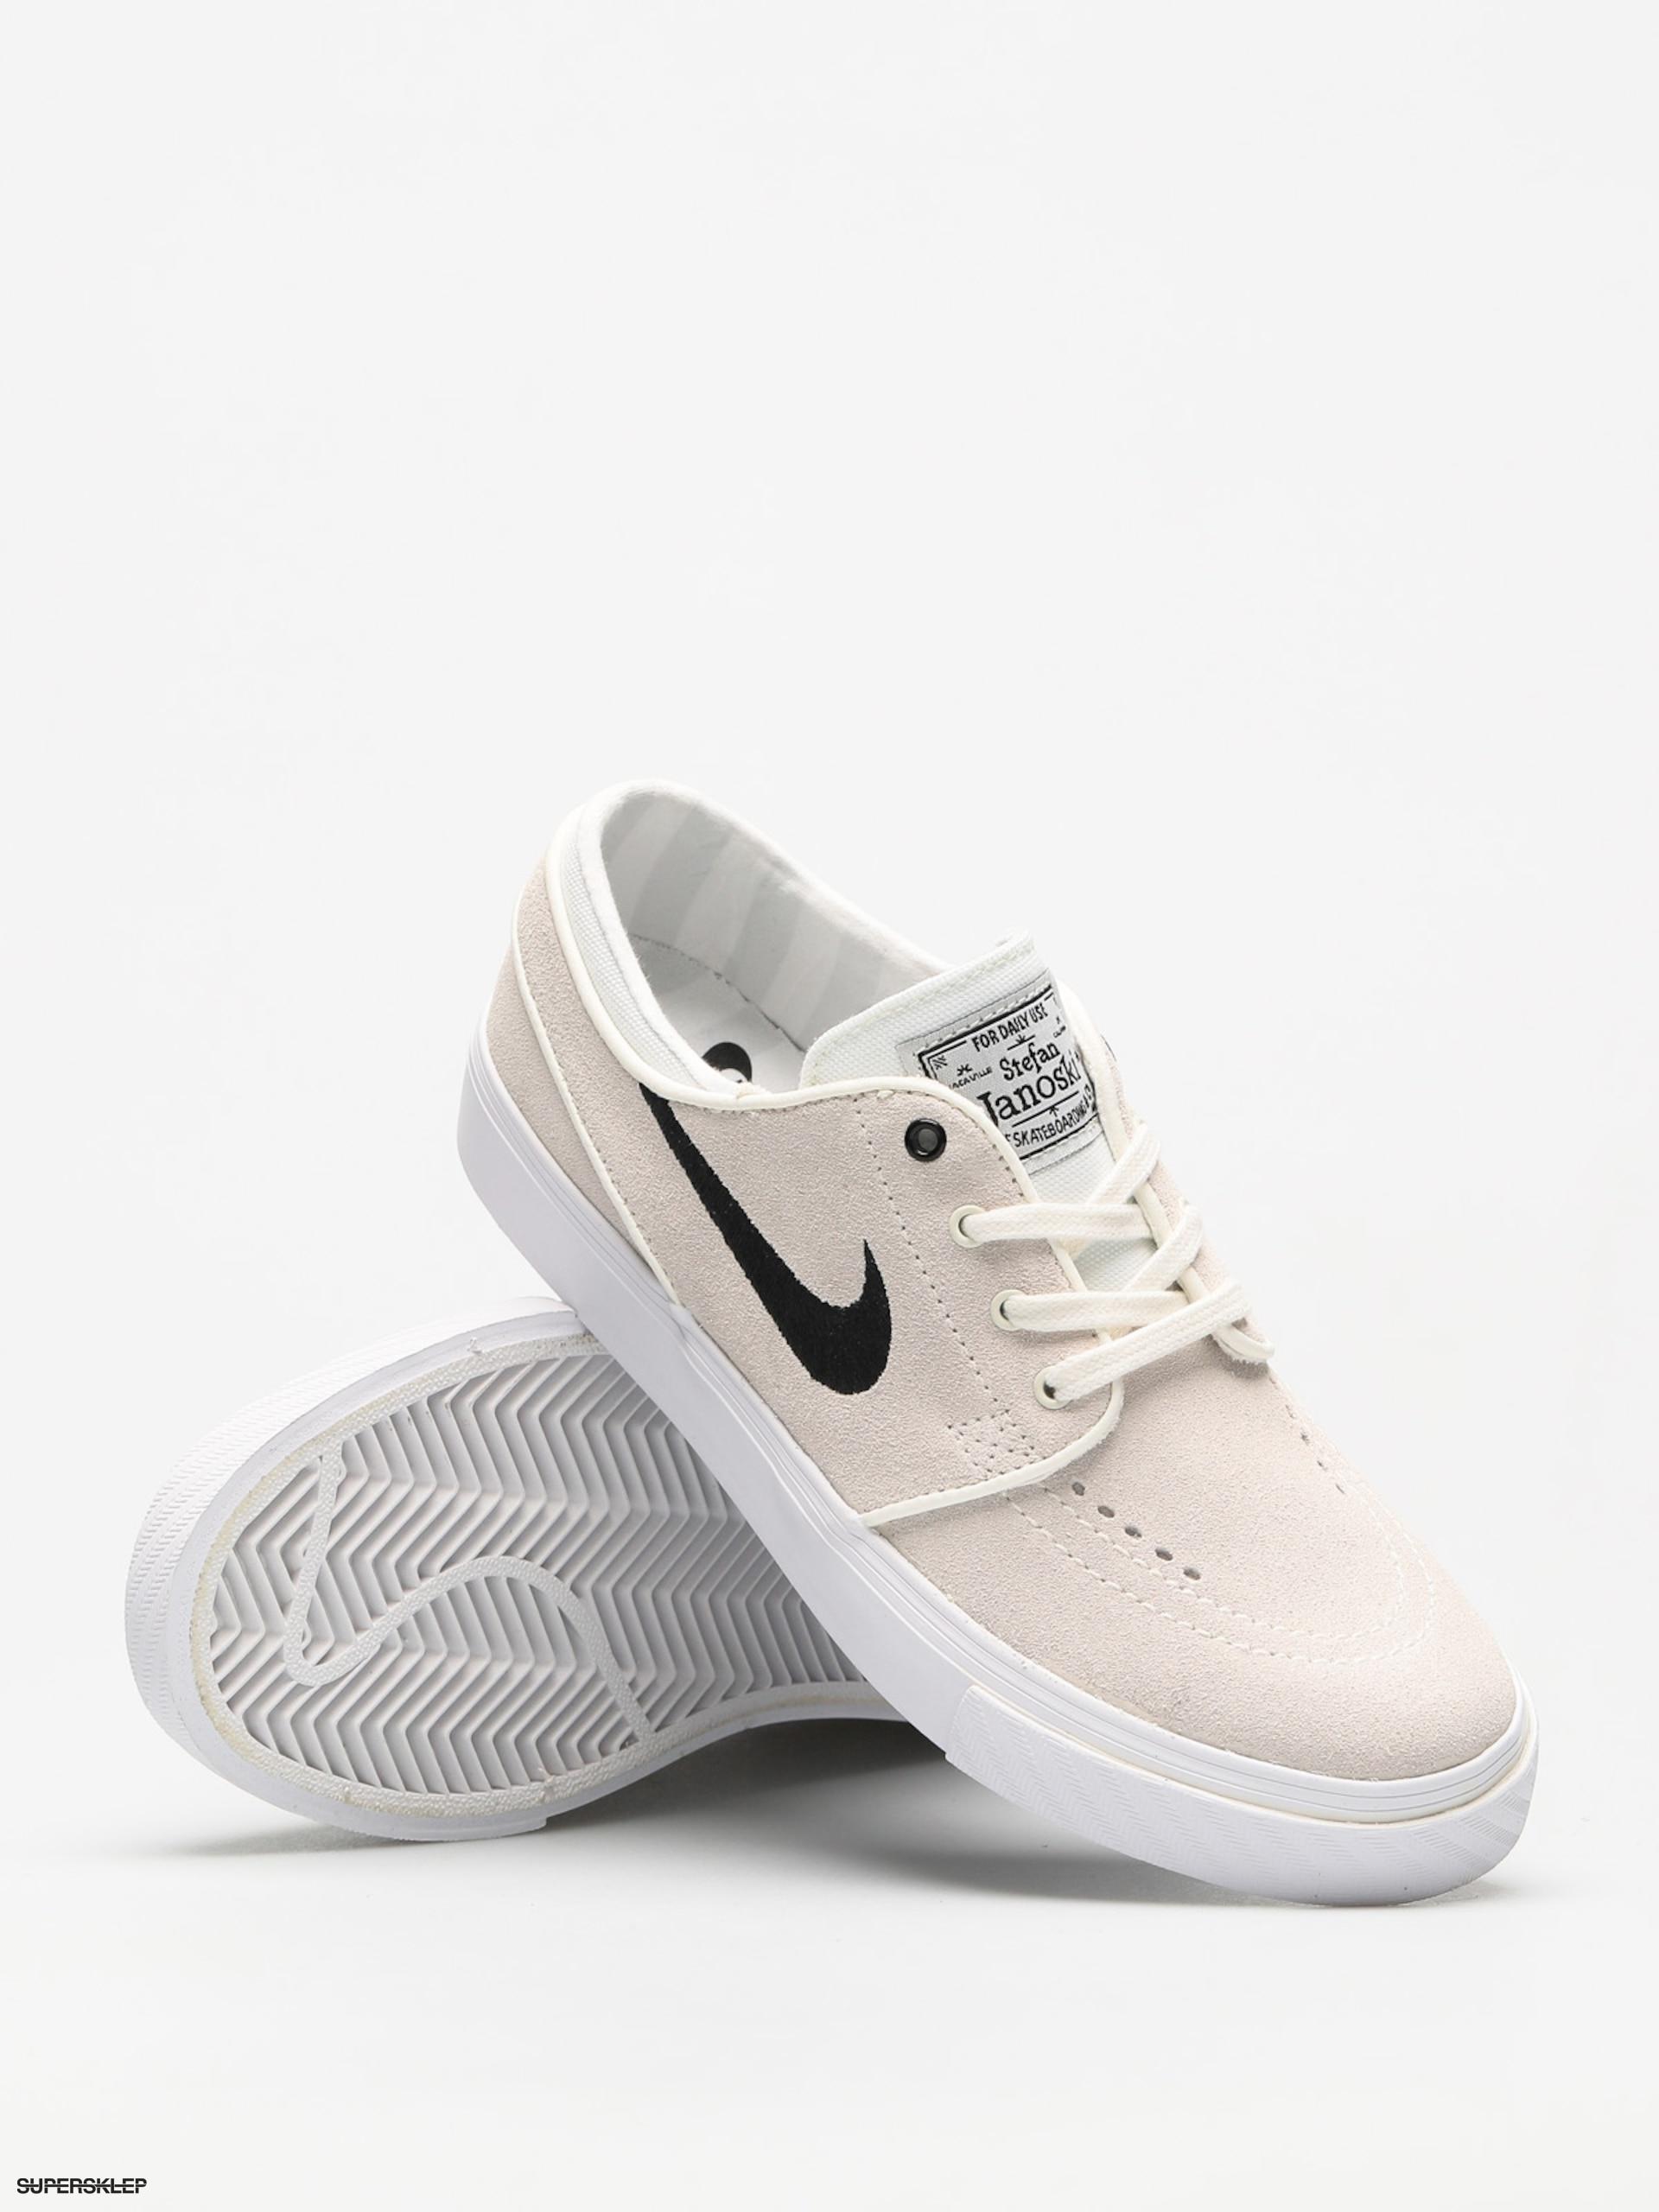 new arrival eaa4c b1ab9 Buty Nike SB Zoom Stefan Janoski (summit white black white pure platinum)